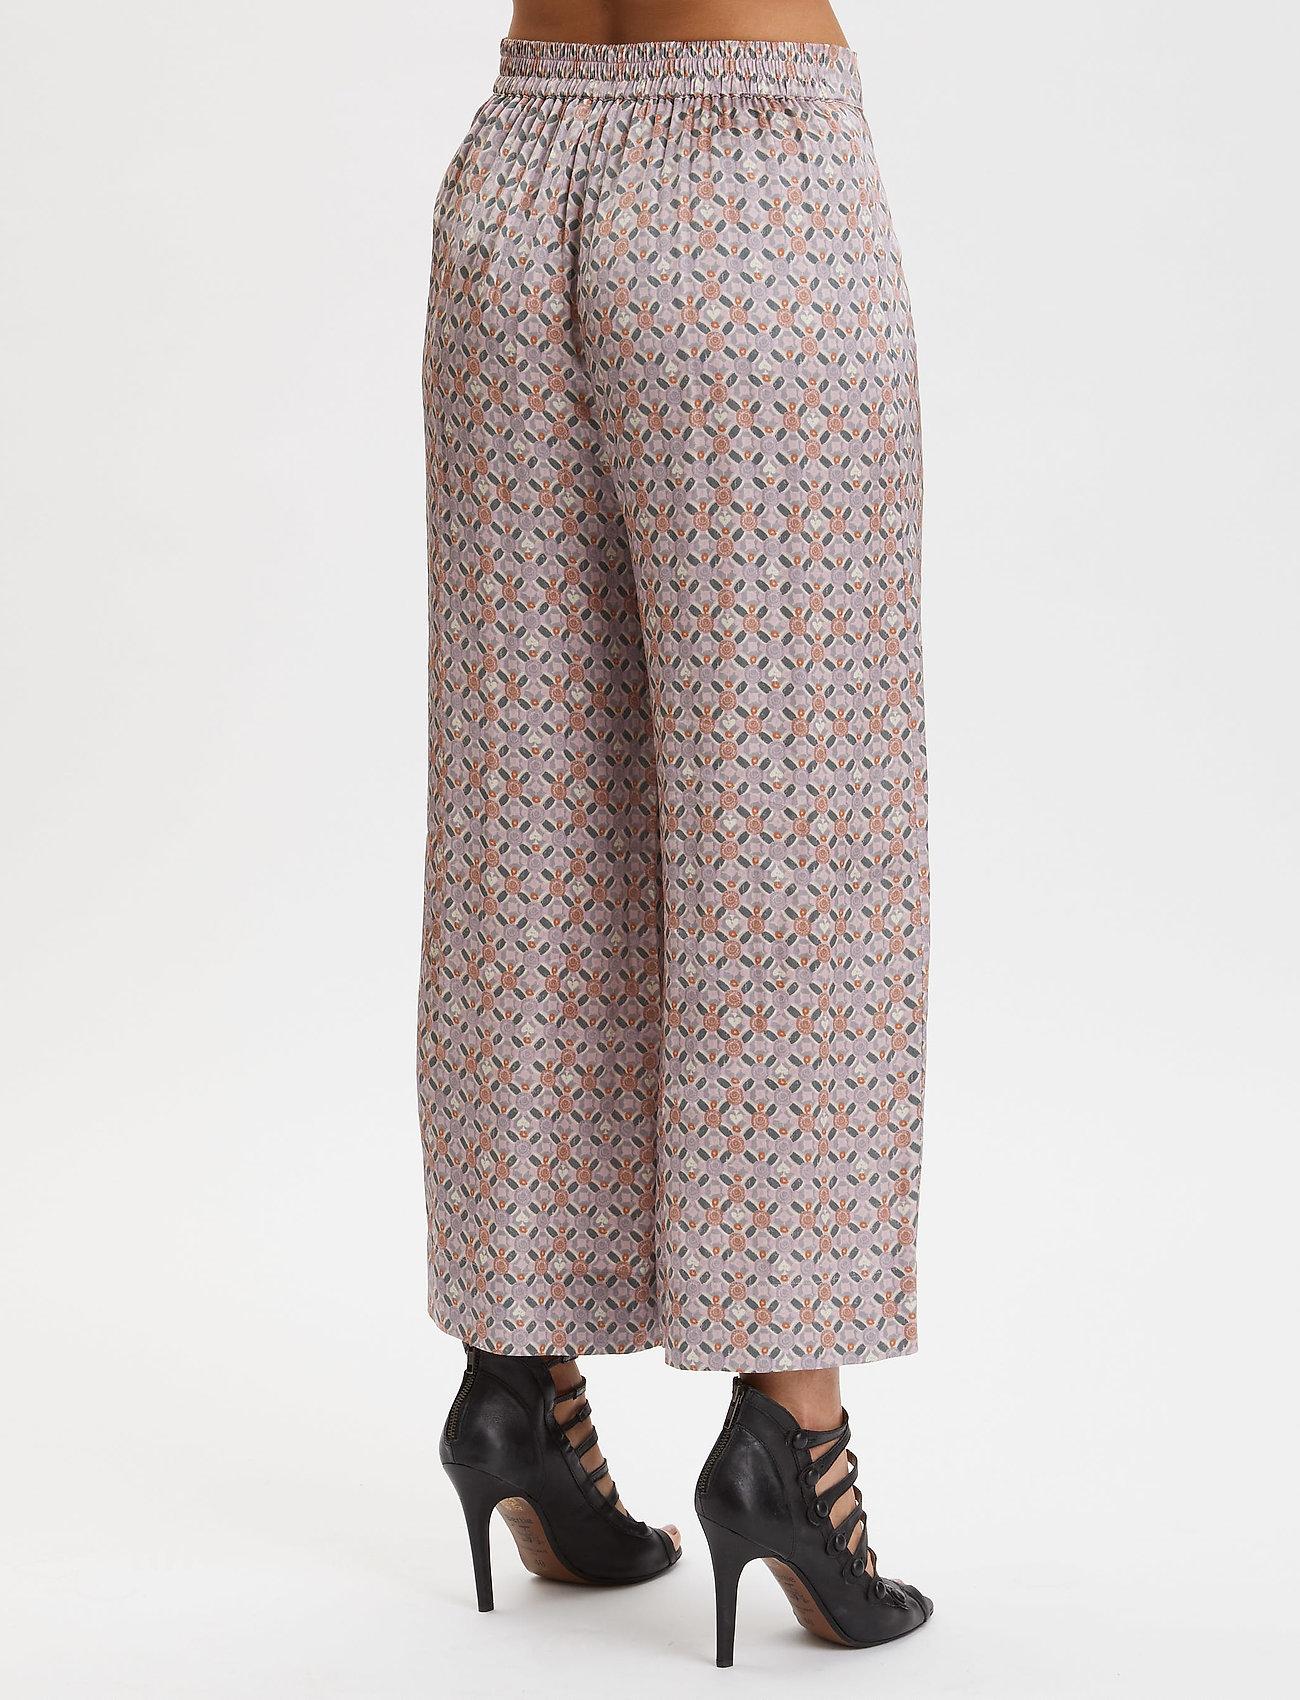 Odd Molly Radiant Pants - Byxor Dried Lavendel